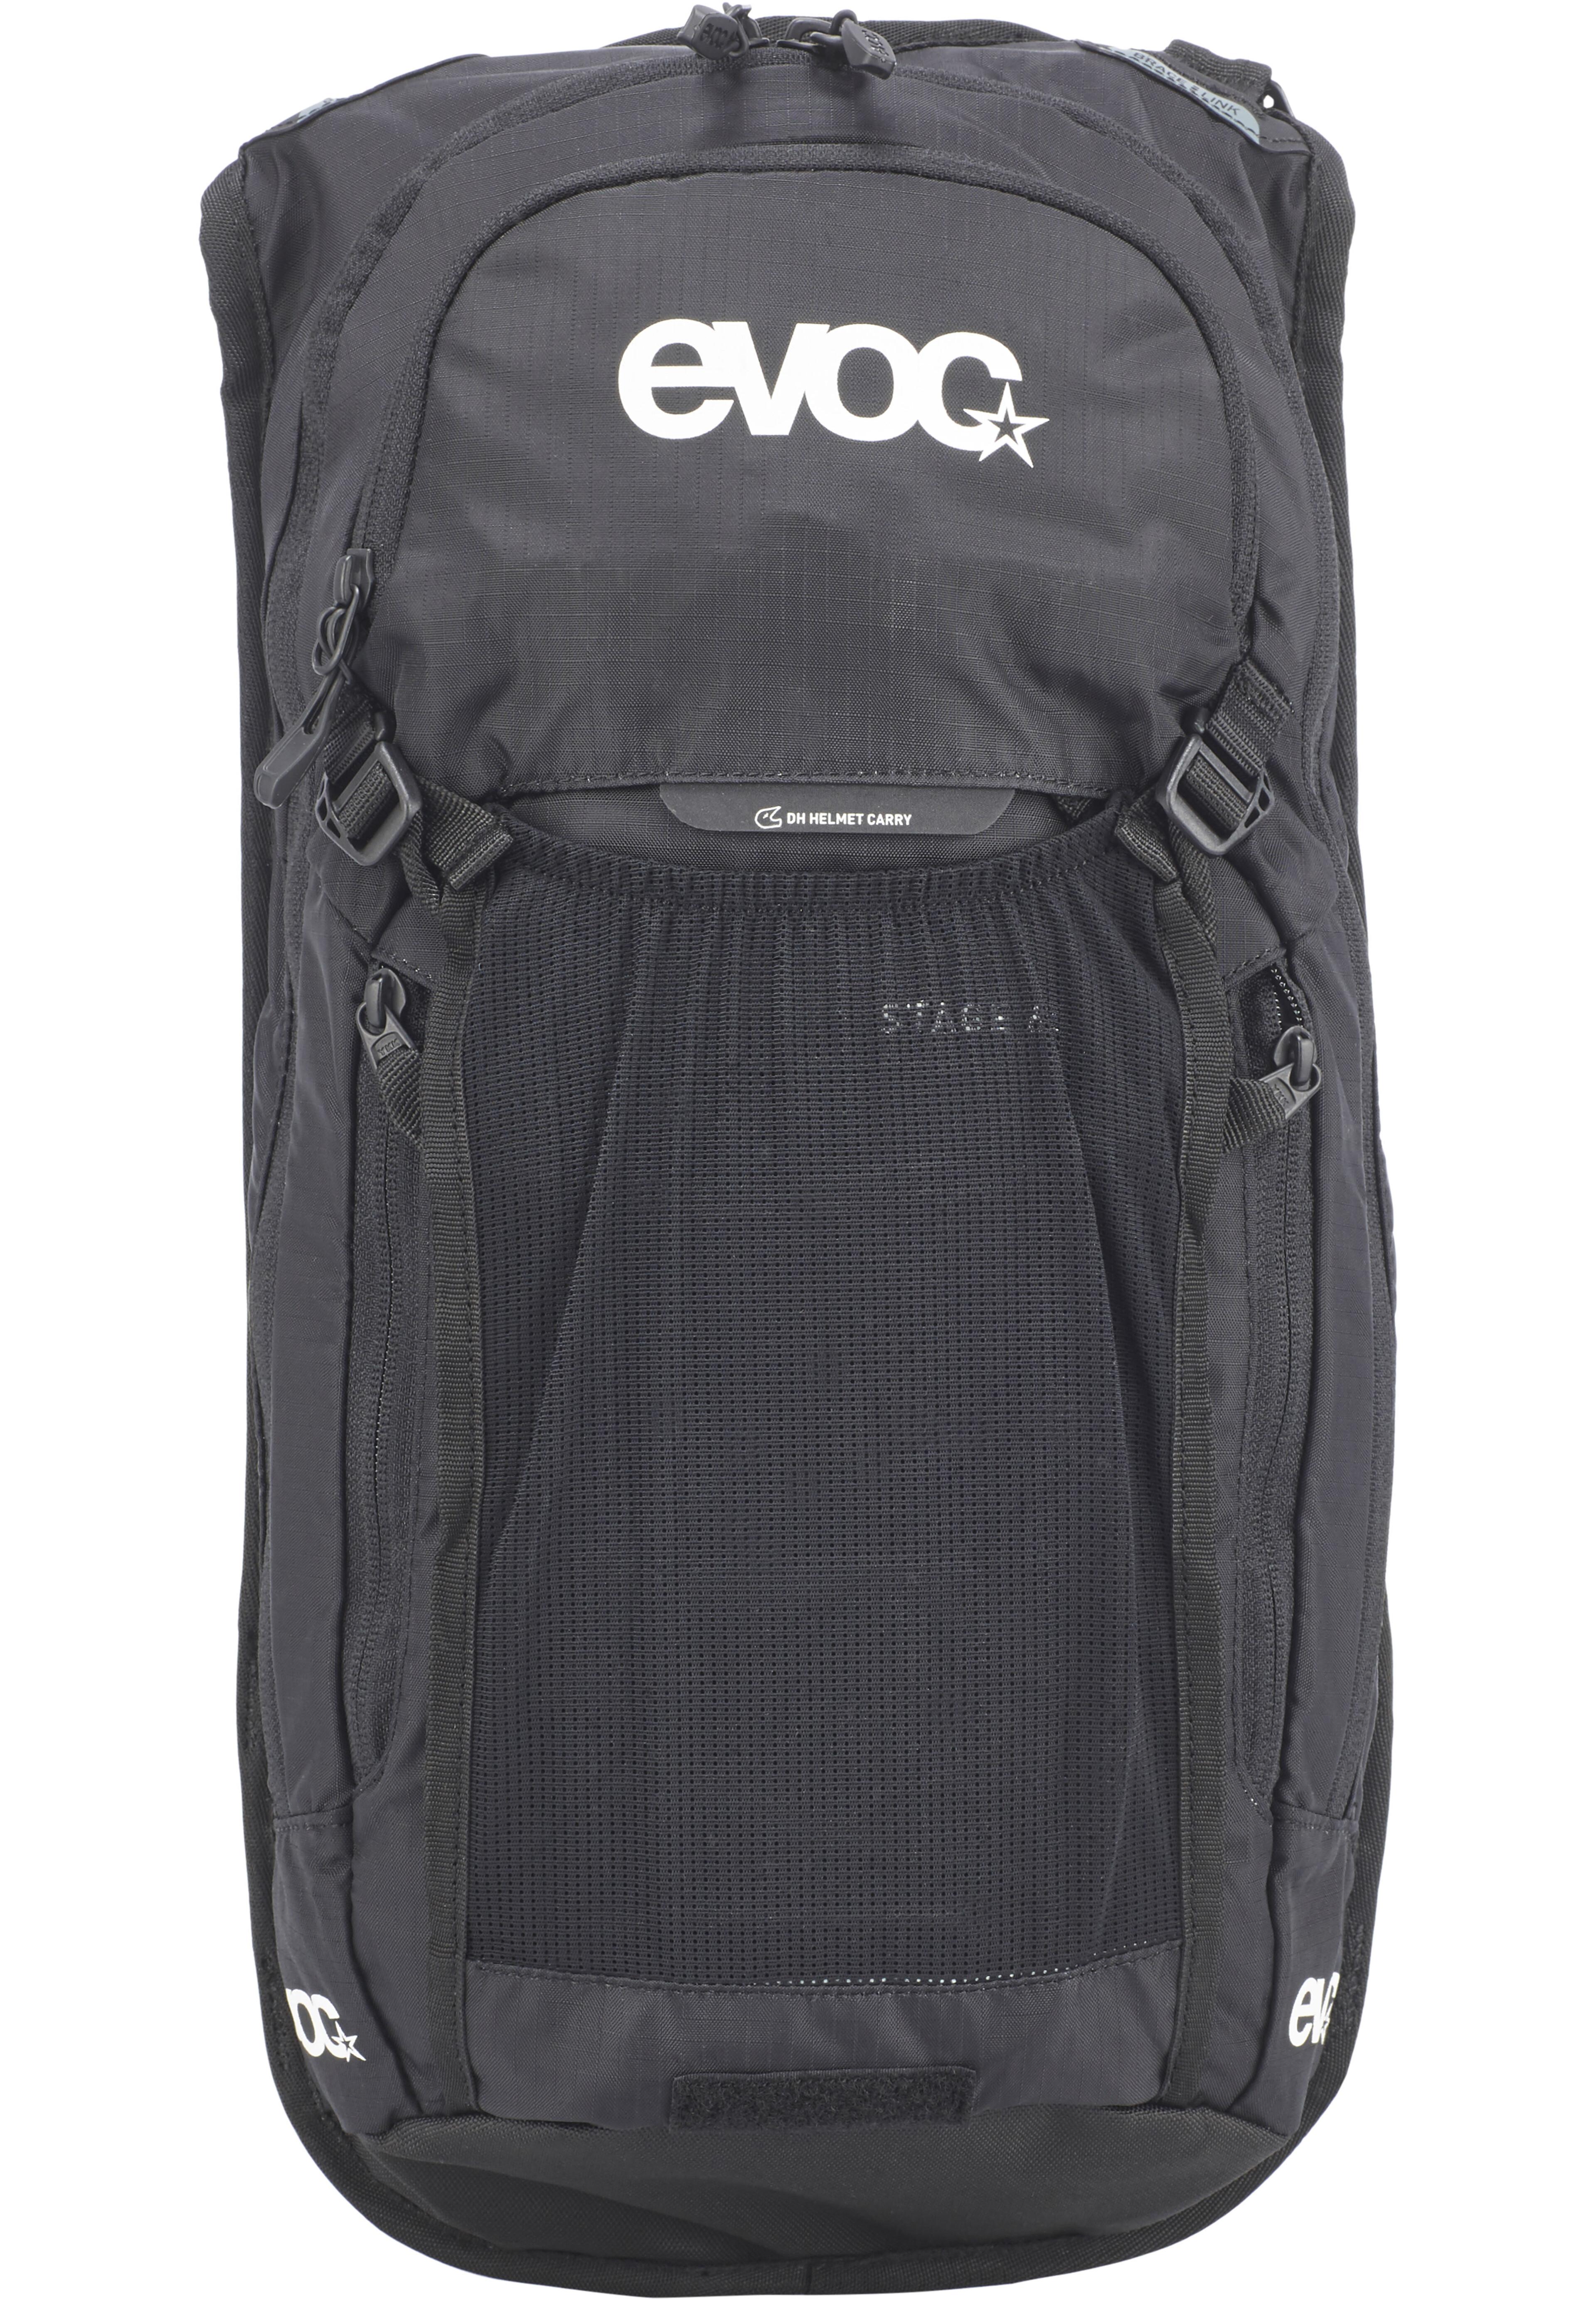 06e1ec966f3 EVOC Stage fietsrugzak 6l + Bladder 2l zwart I Eenvoudig online bij ...